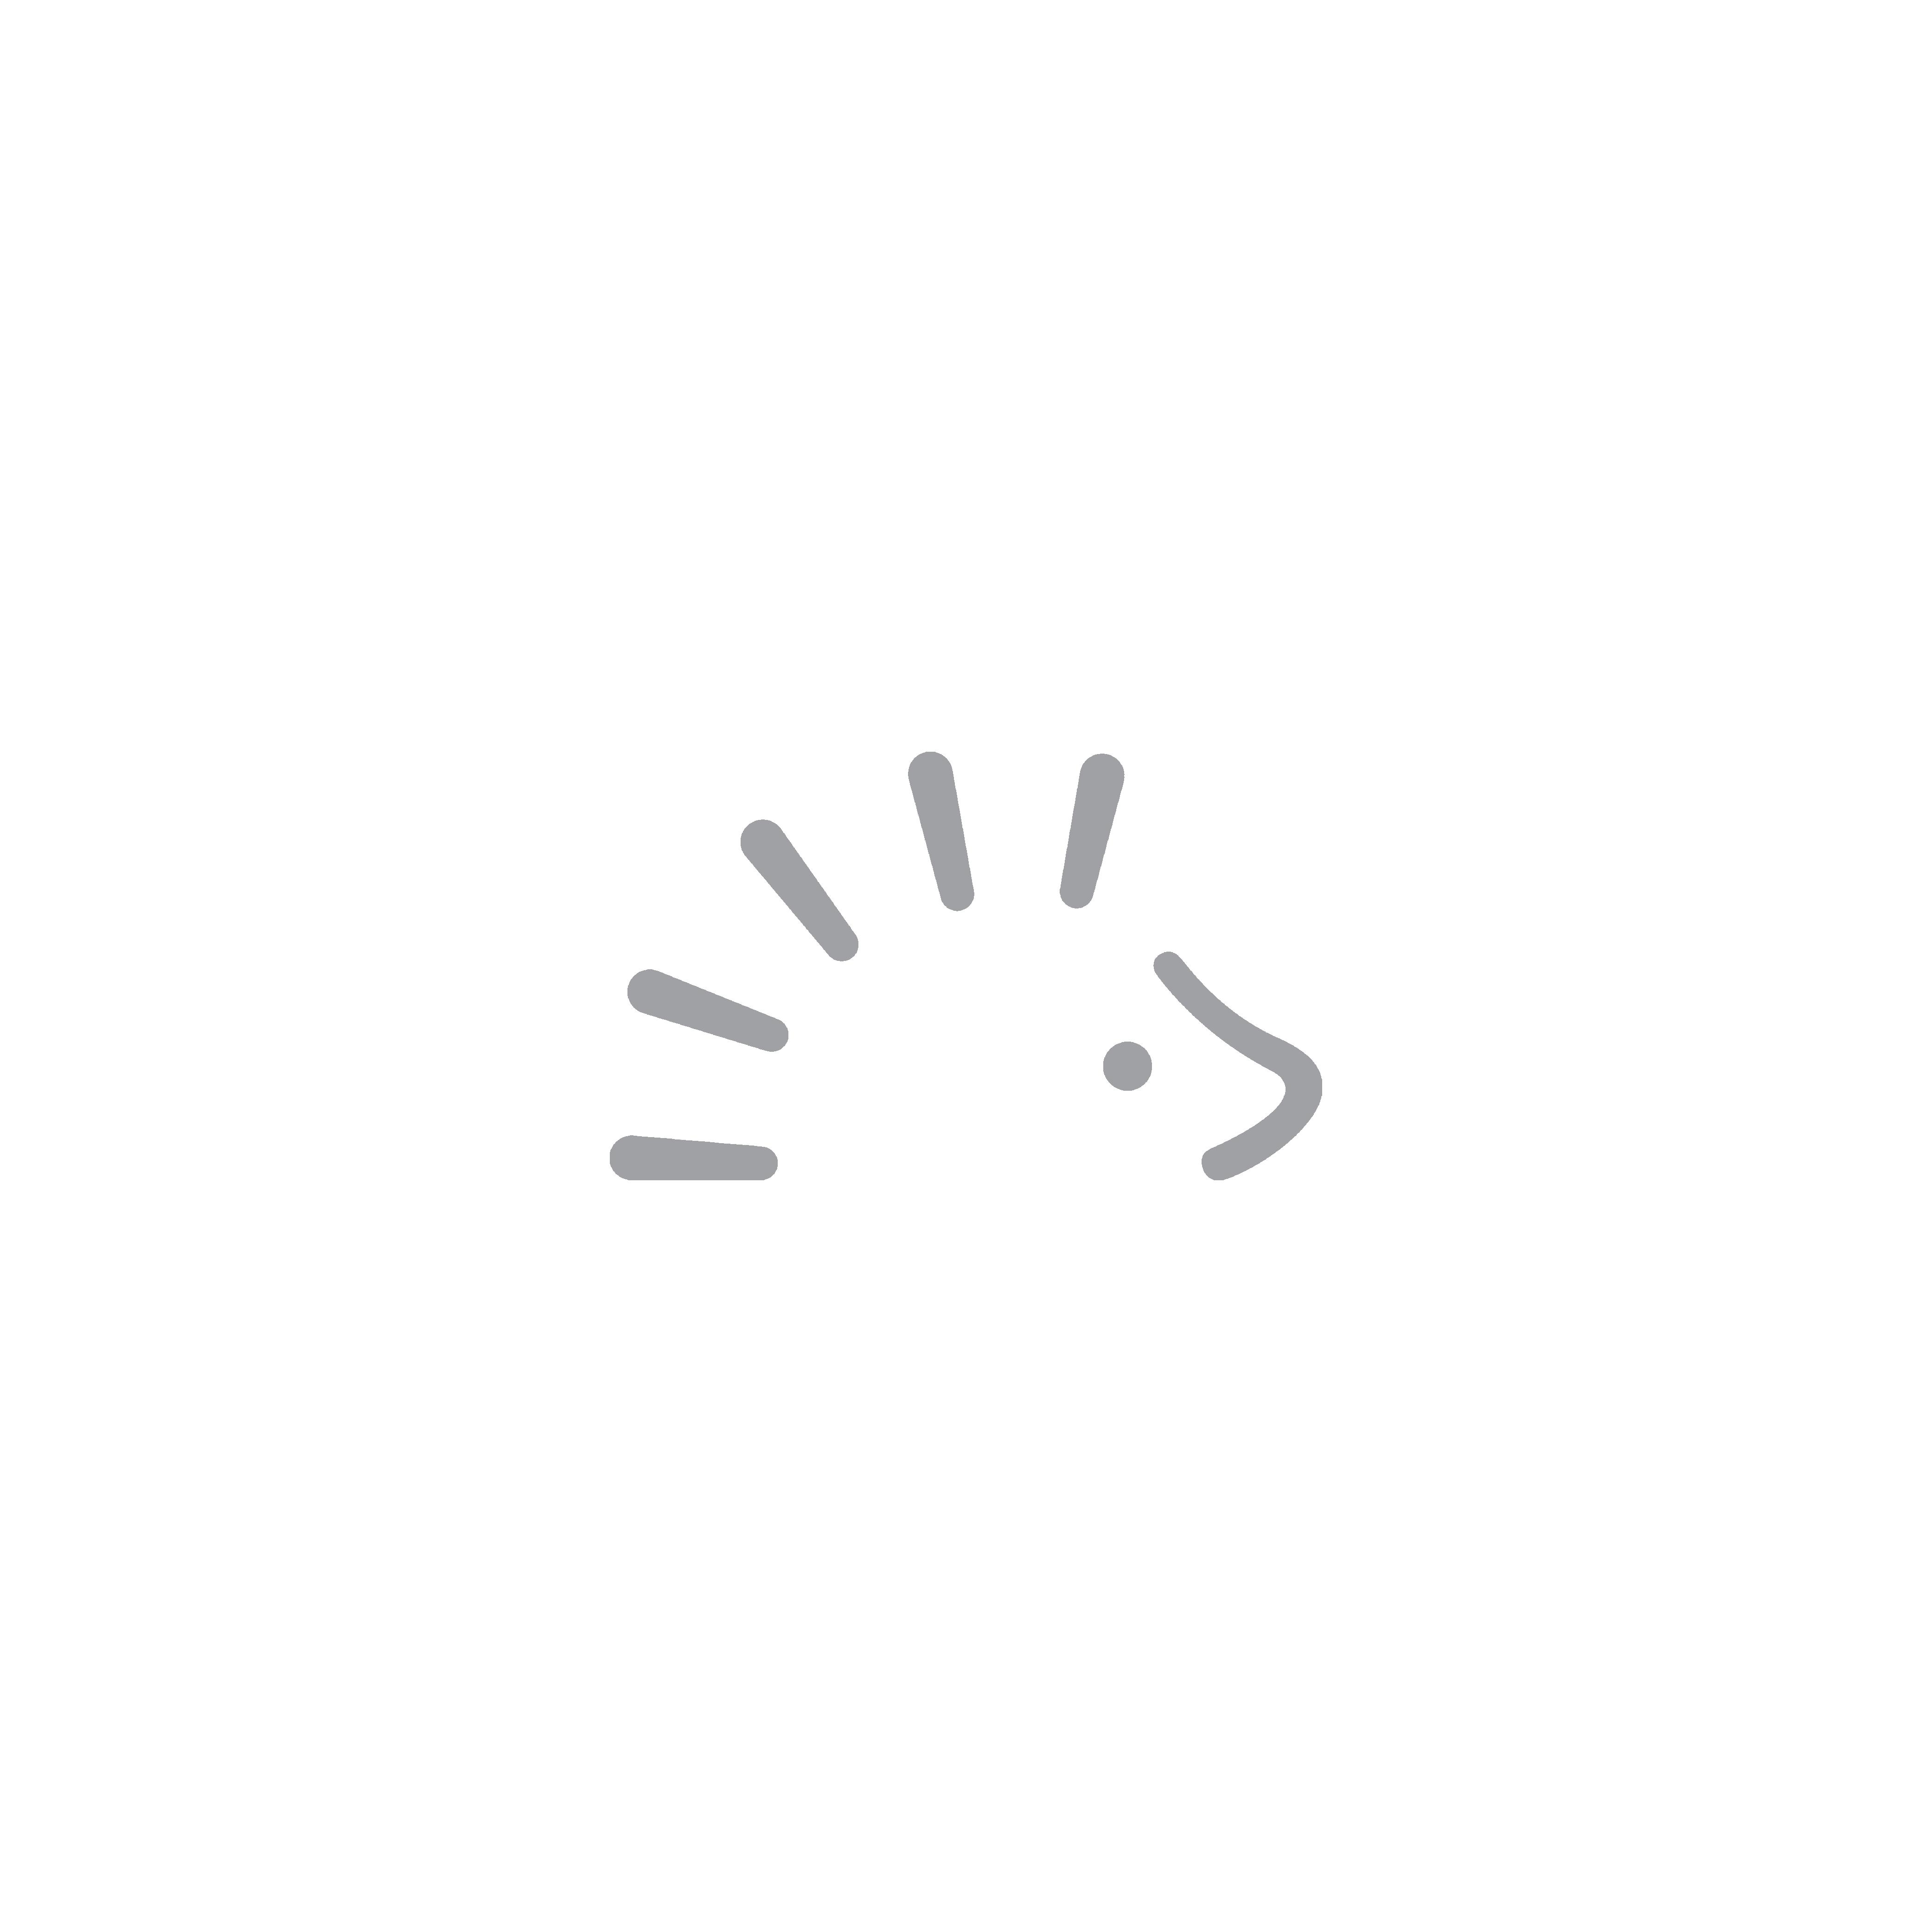 Babyschuhe Balu ABS mit Noppensohle